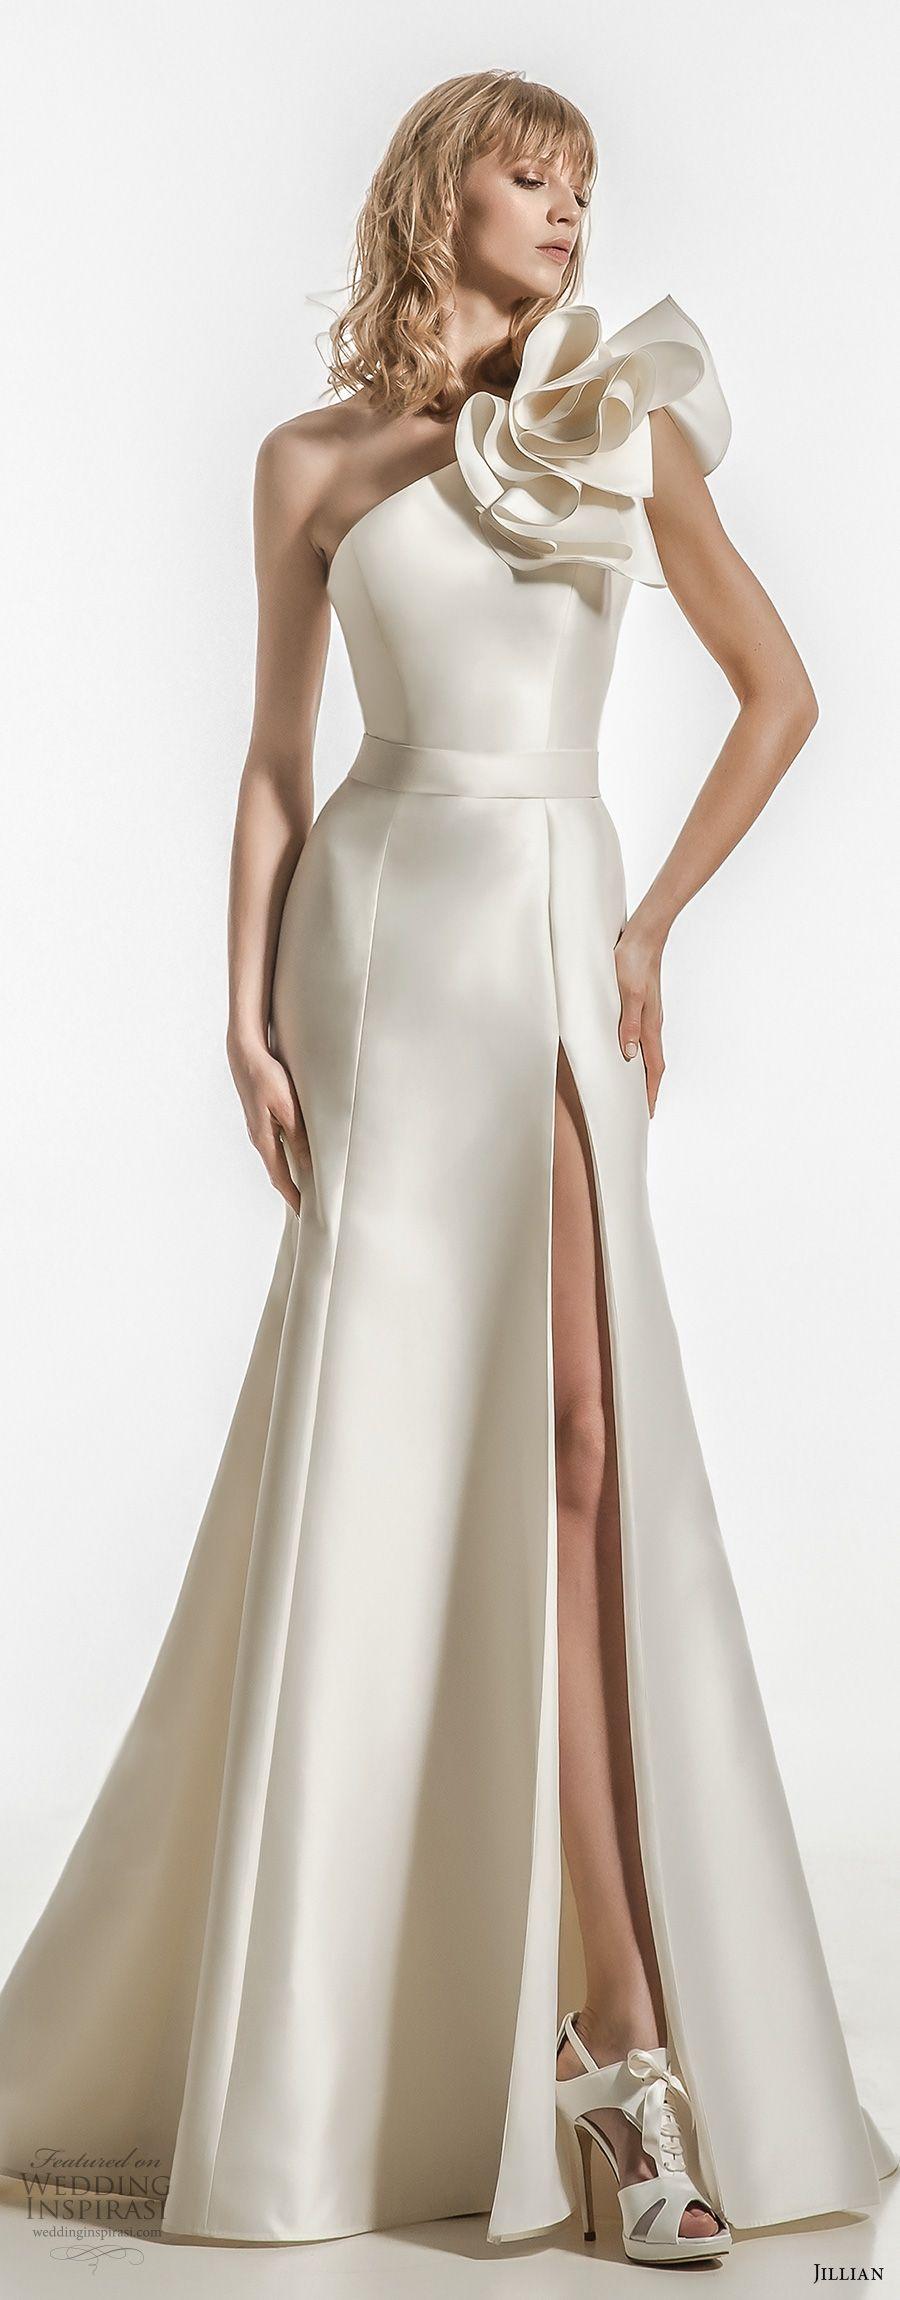 Jillian 2018 wedding dresses neckline wedding dress and for Elegant and classy wedding dresses